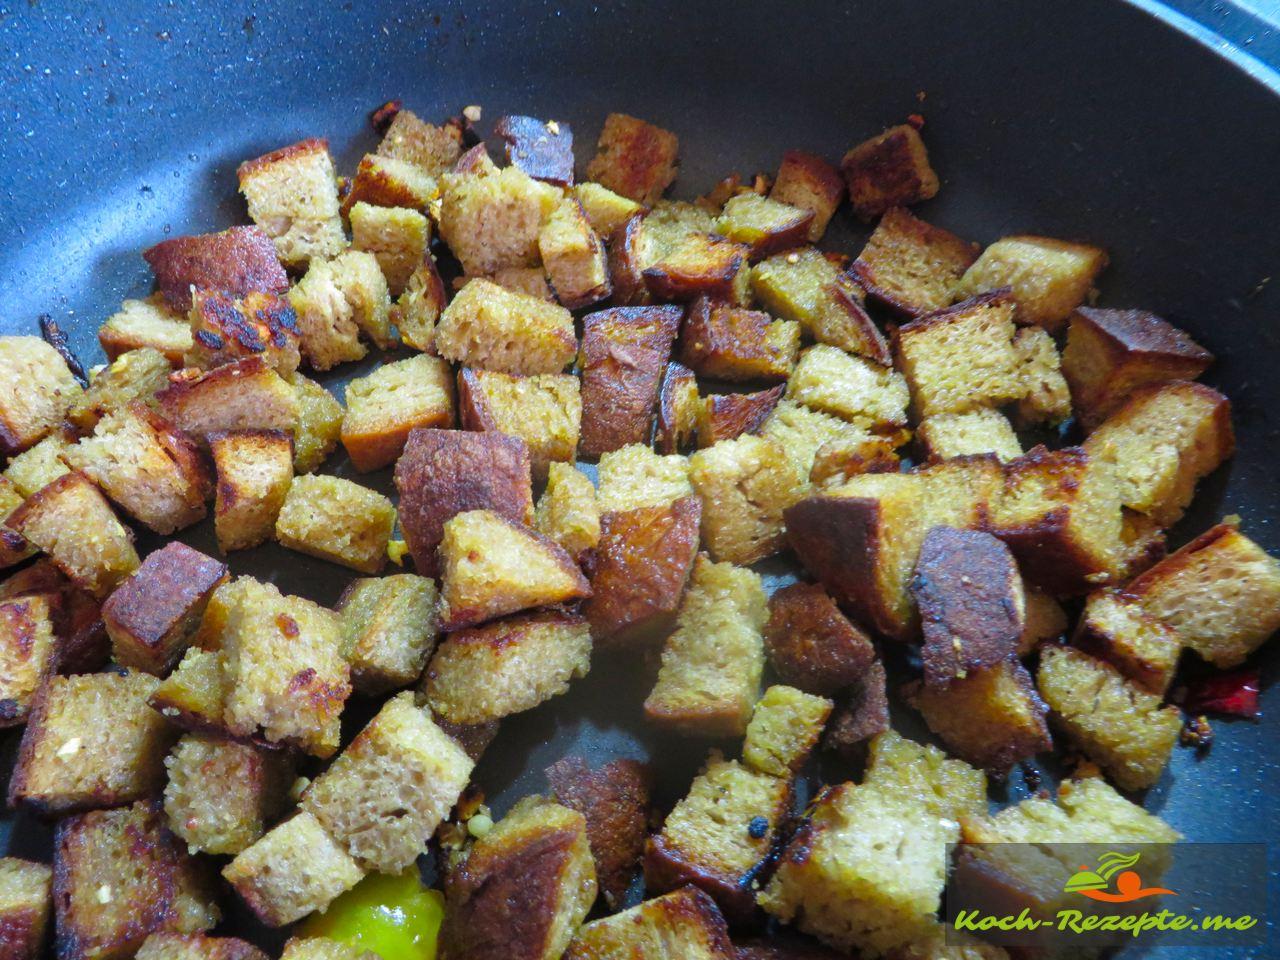 geröstetes Roggenbrot  für einen Brotsalat Rezept